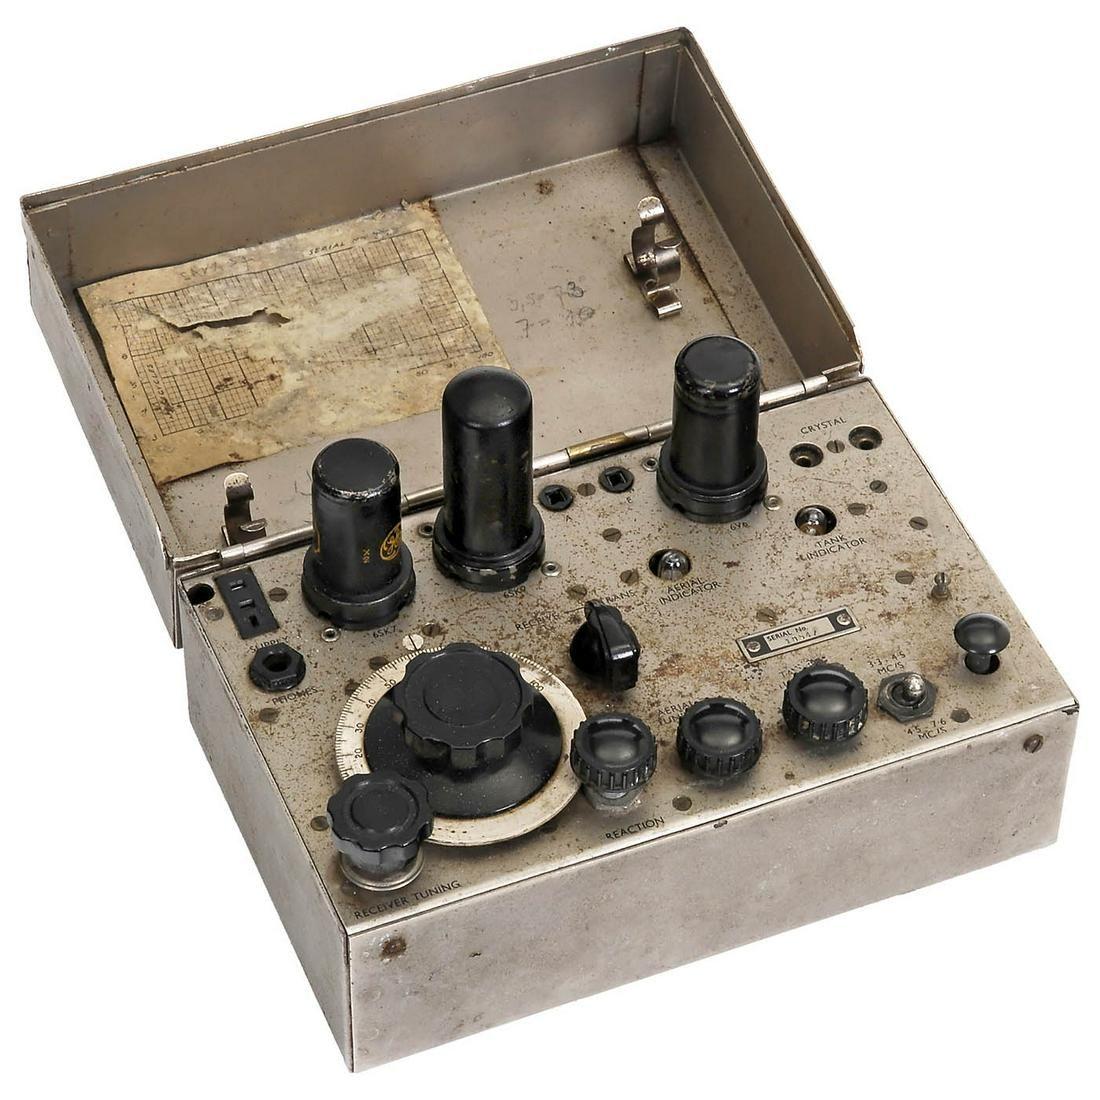 Whaddon Mk VII - Paraset Clandestine Radio, c. 1942